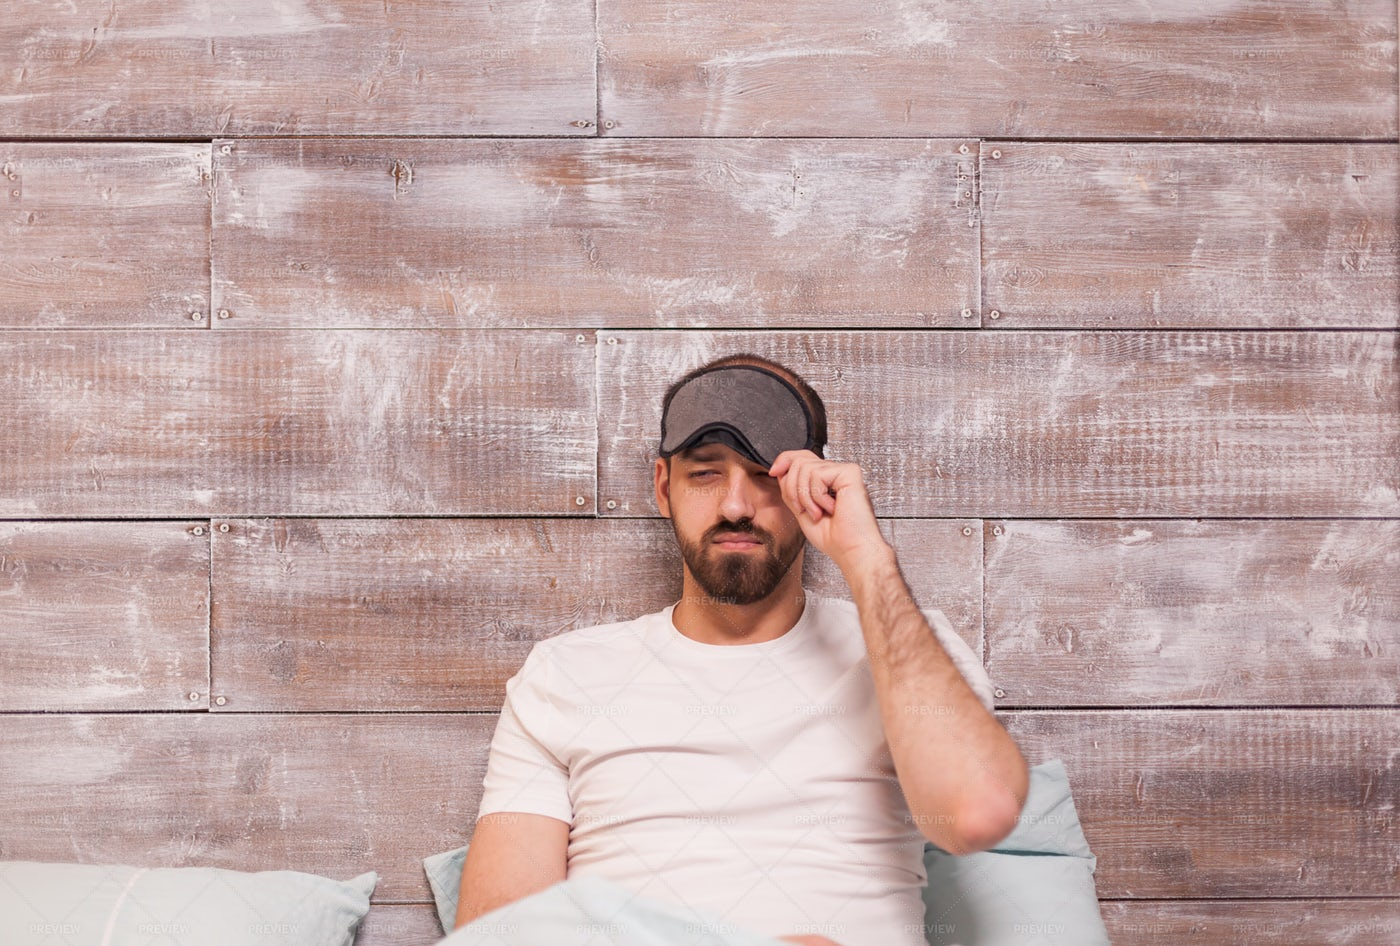 Wearing Sleep Mask: Stock Photos